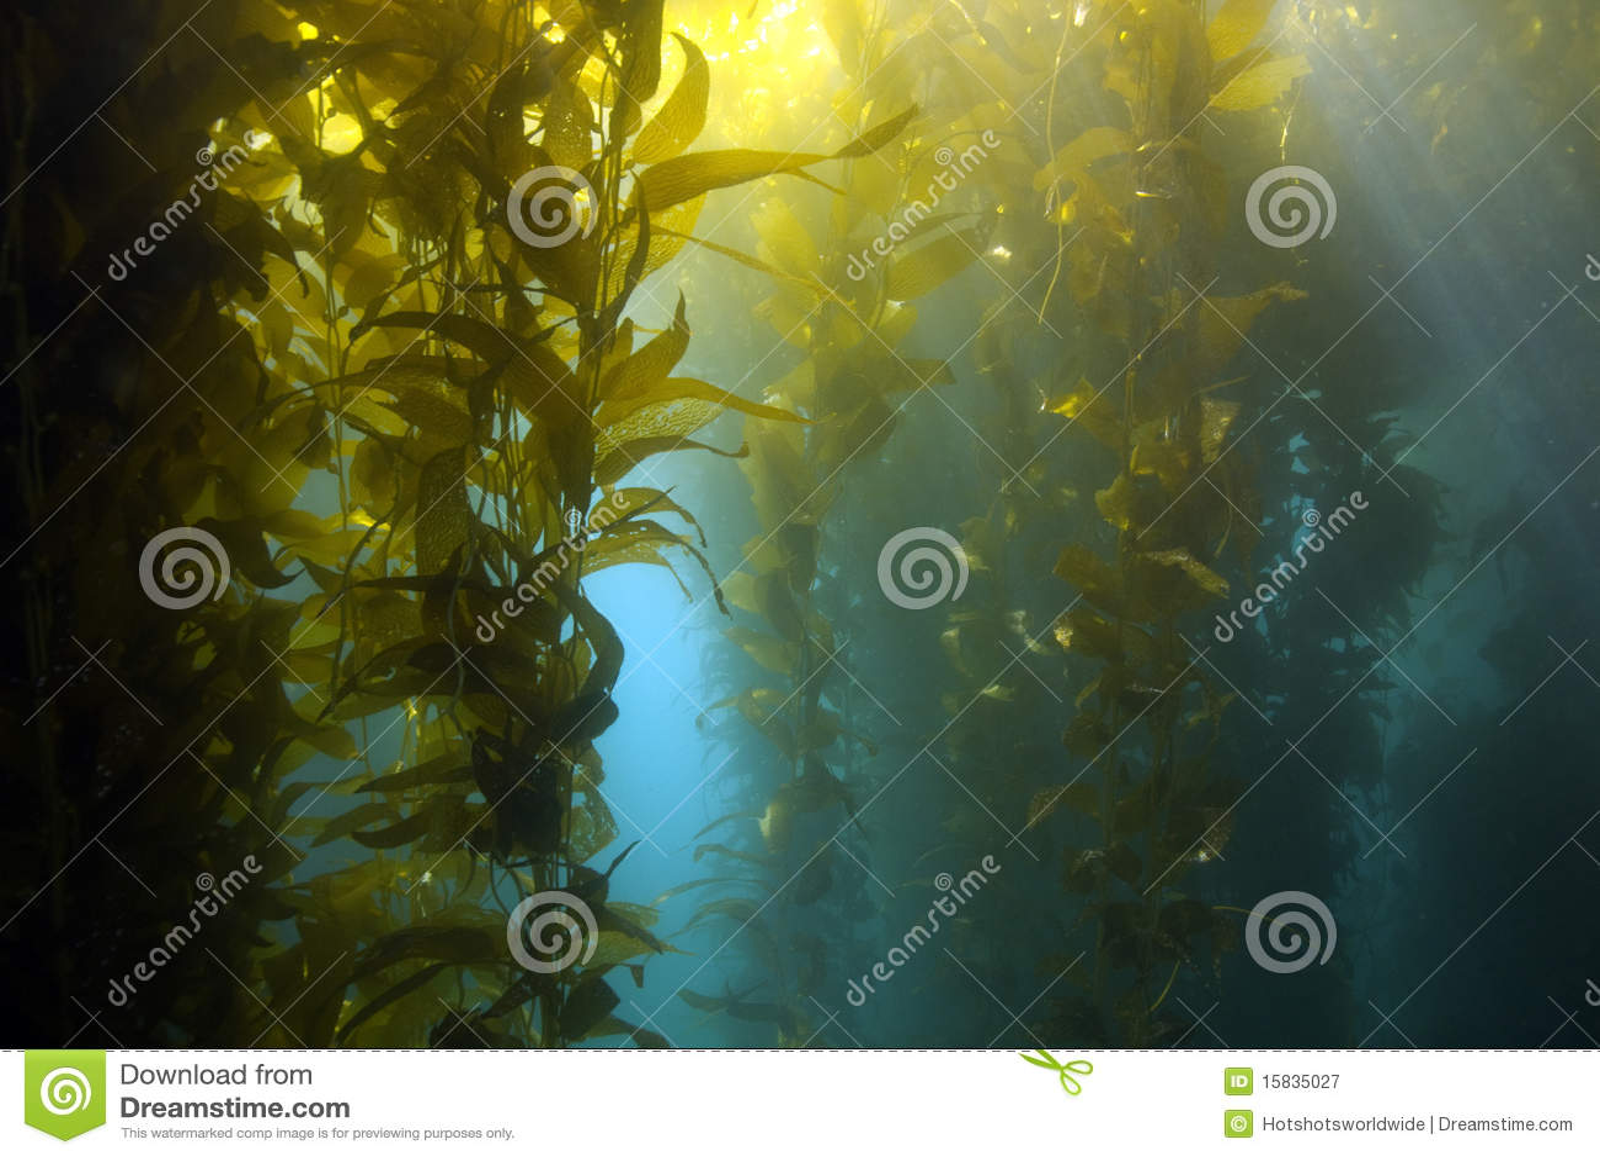 Onderwater kelpbos, het eiland van Catalina, Californië